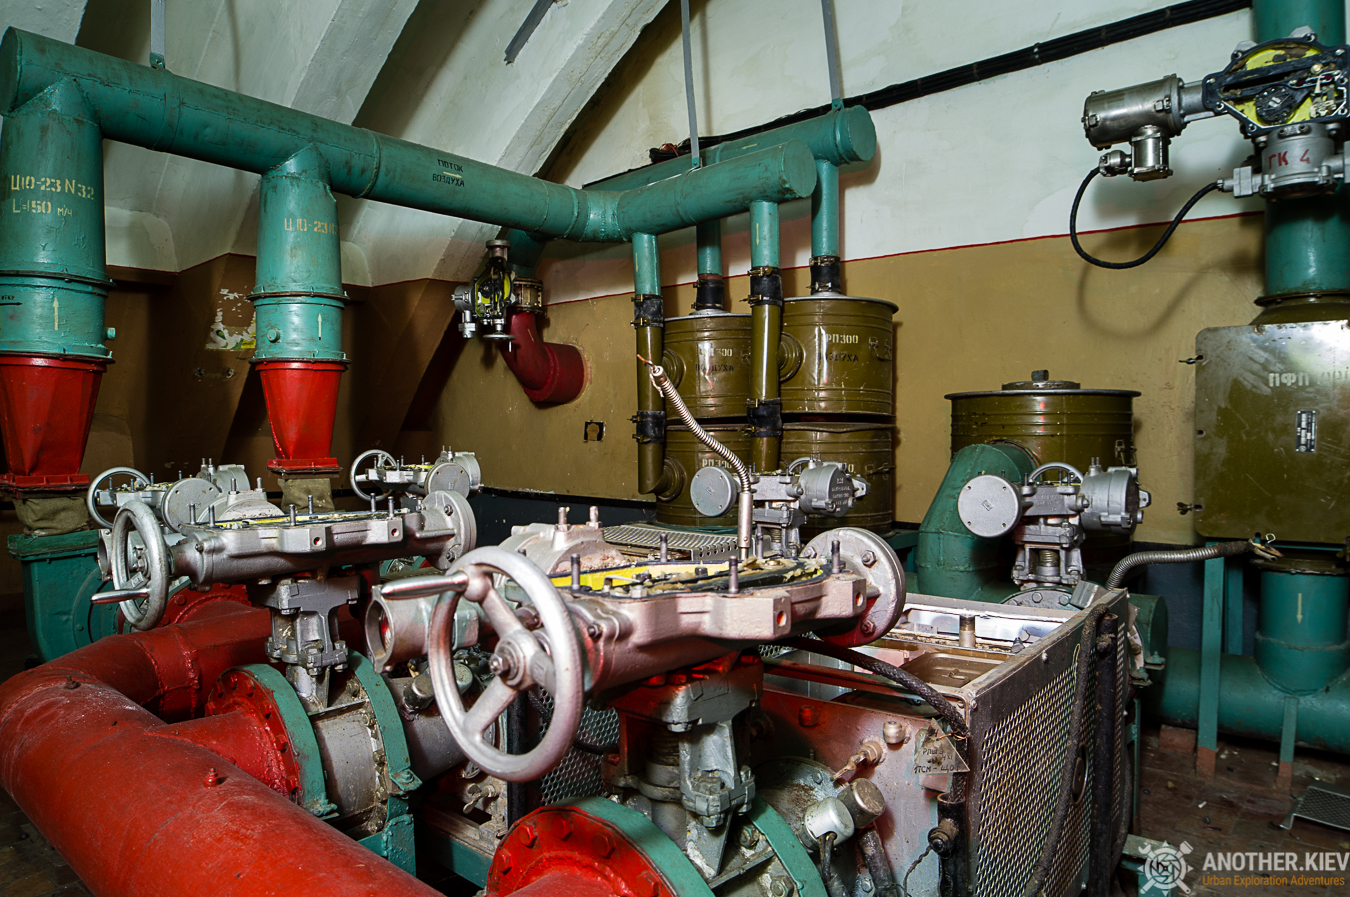 Inside ventilation system of aircraft bunker in southern Ukraine